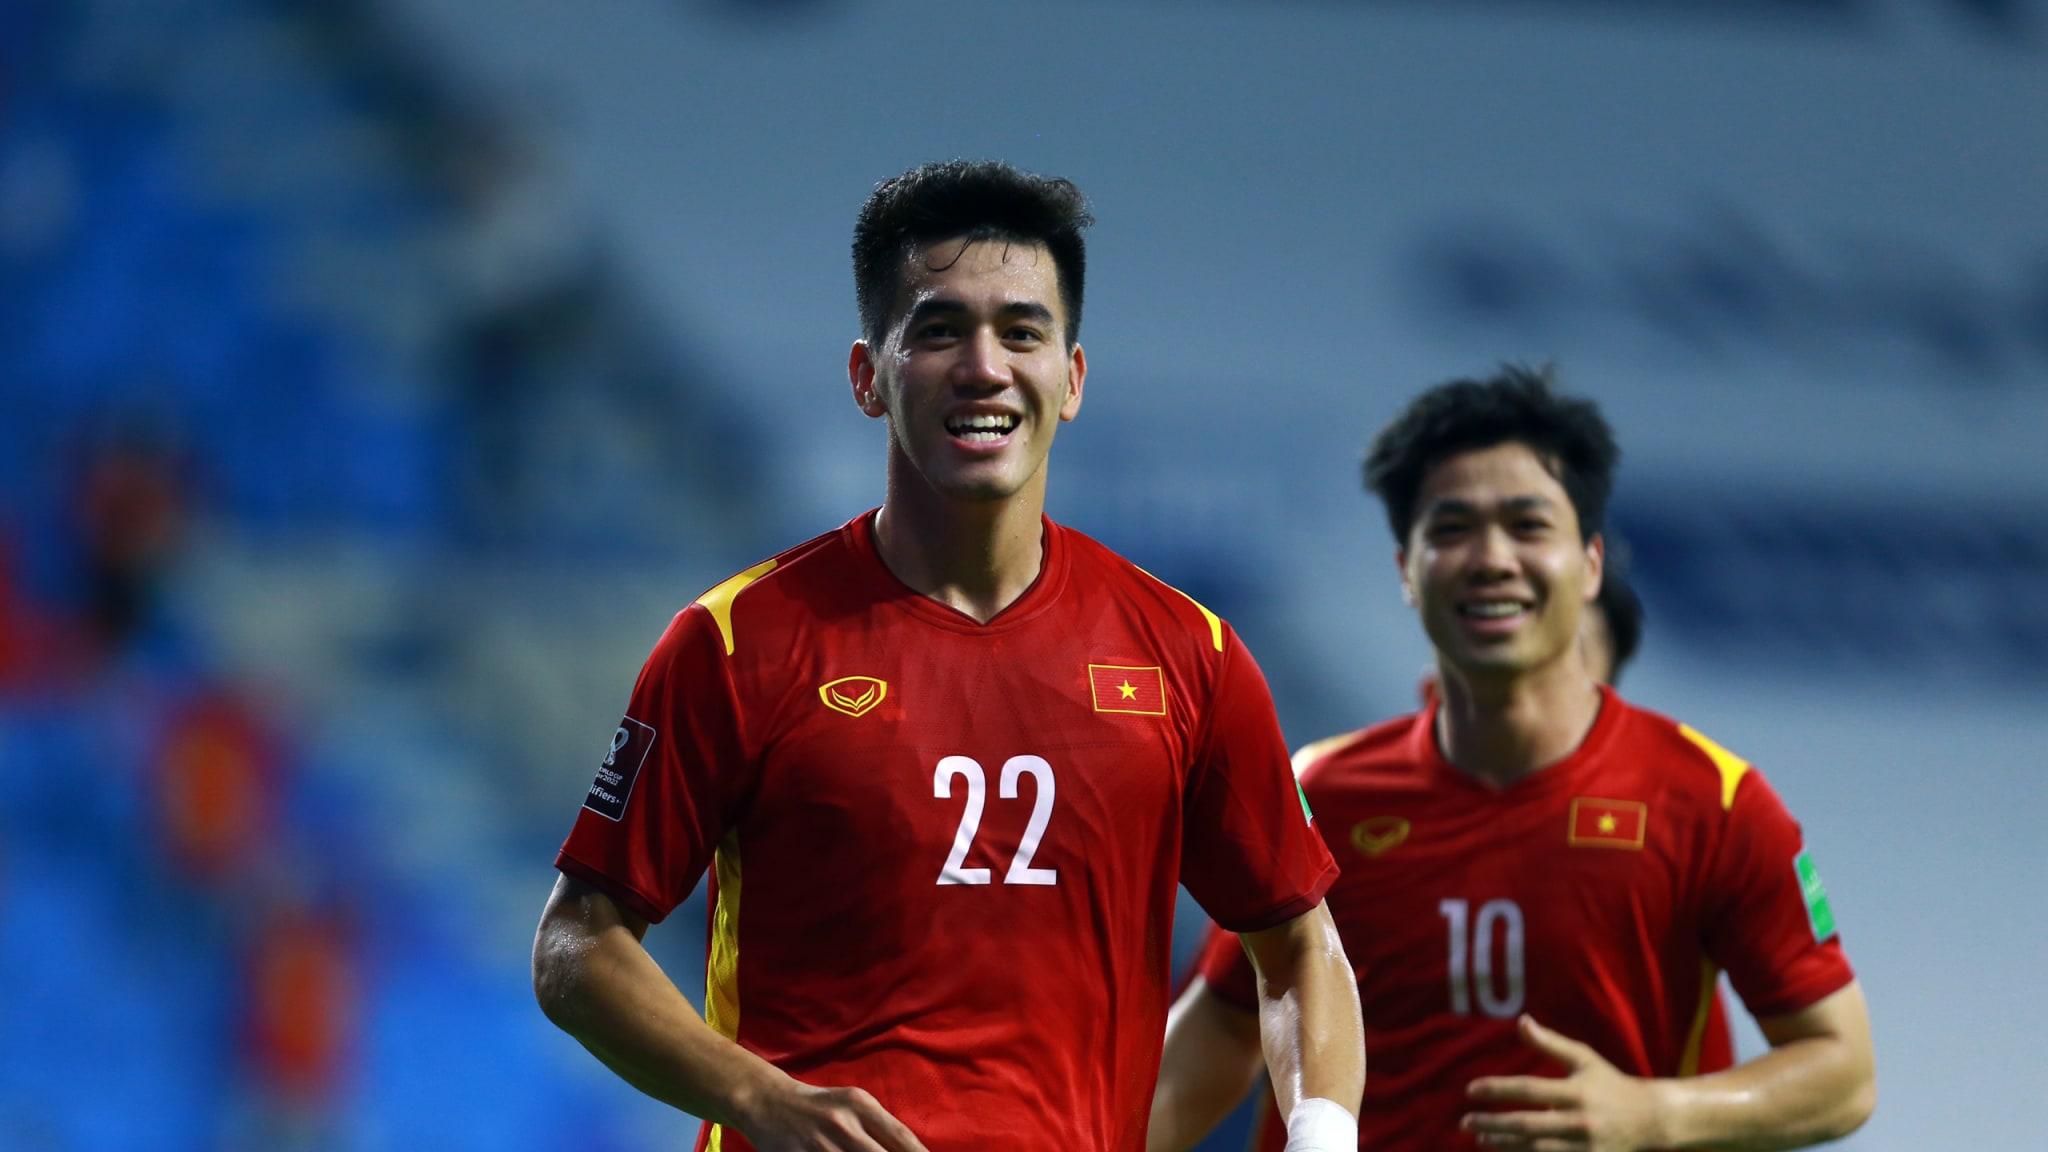 Vietnam vs Indonesia, FIFA World Cup Qatar 2022 qualifying